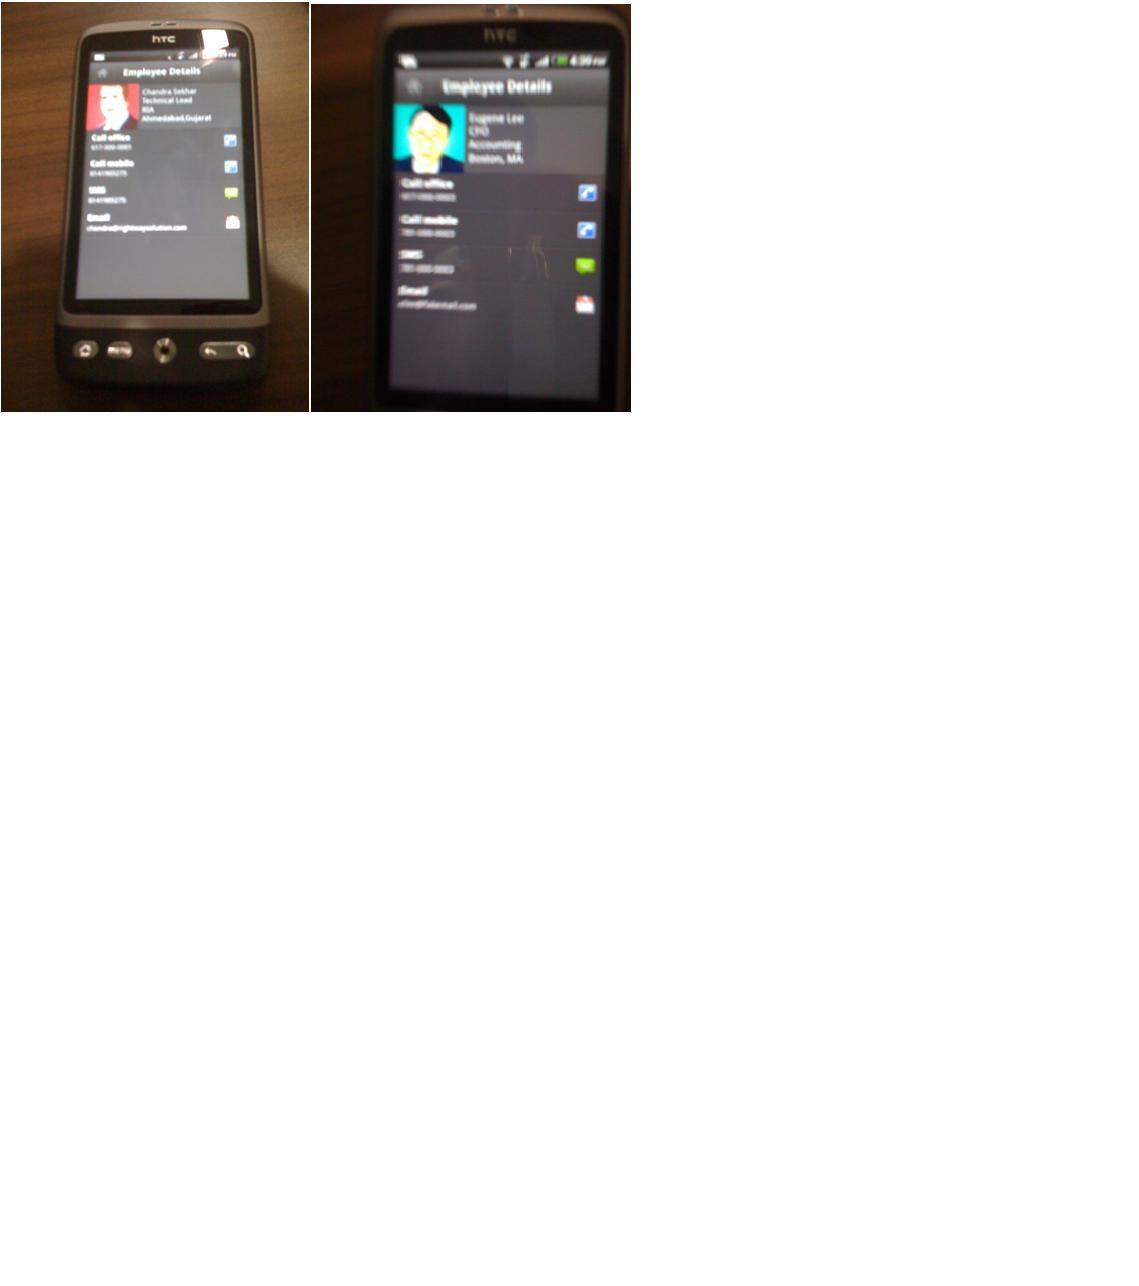 Android_AdobeAIR